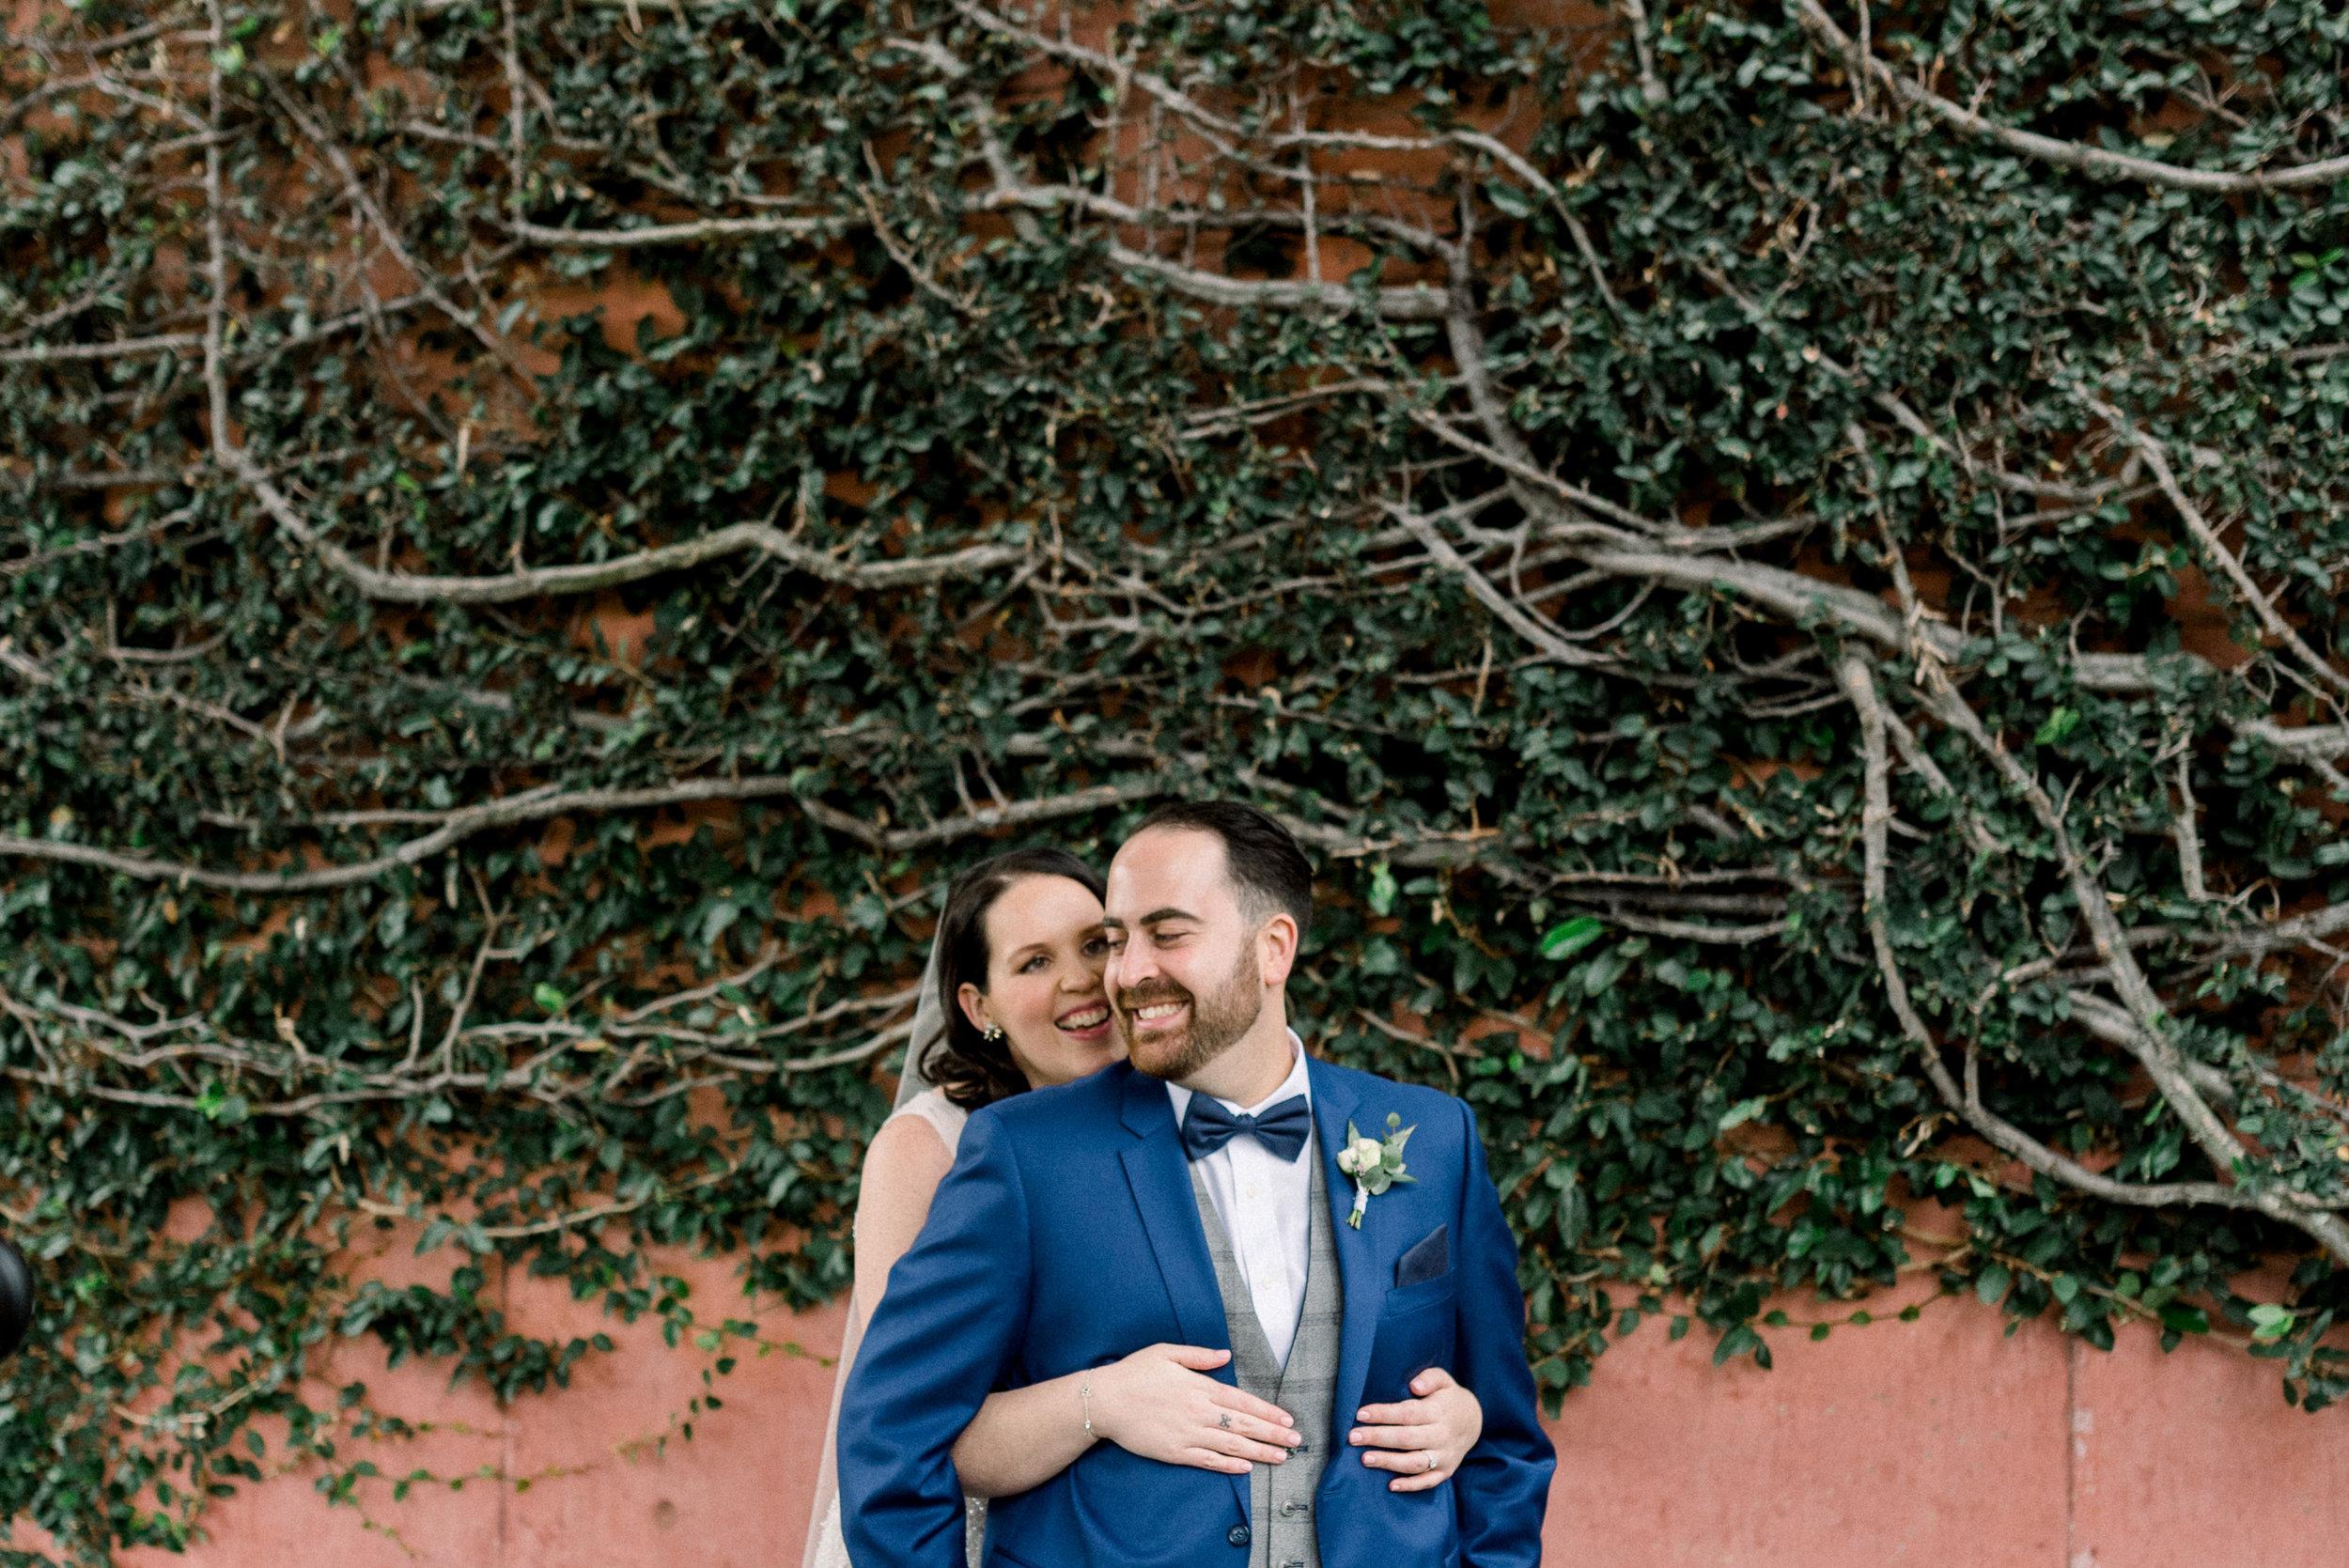 brisbane-city-wedding-photographer-romantic-wedding-67.jpg